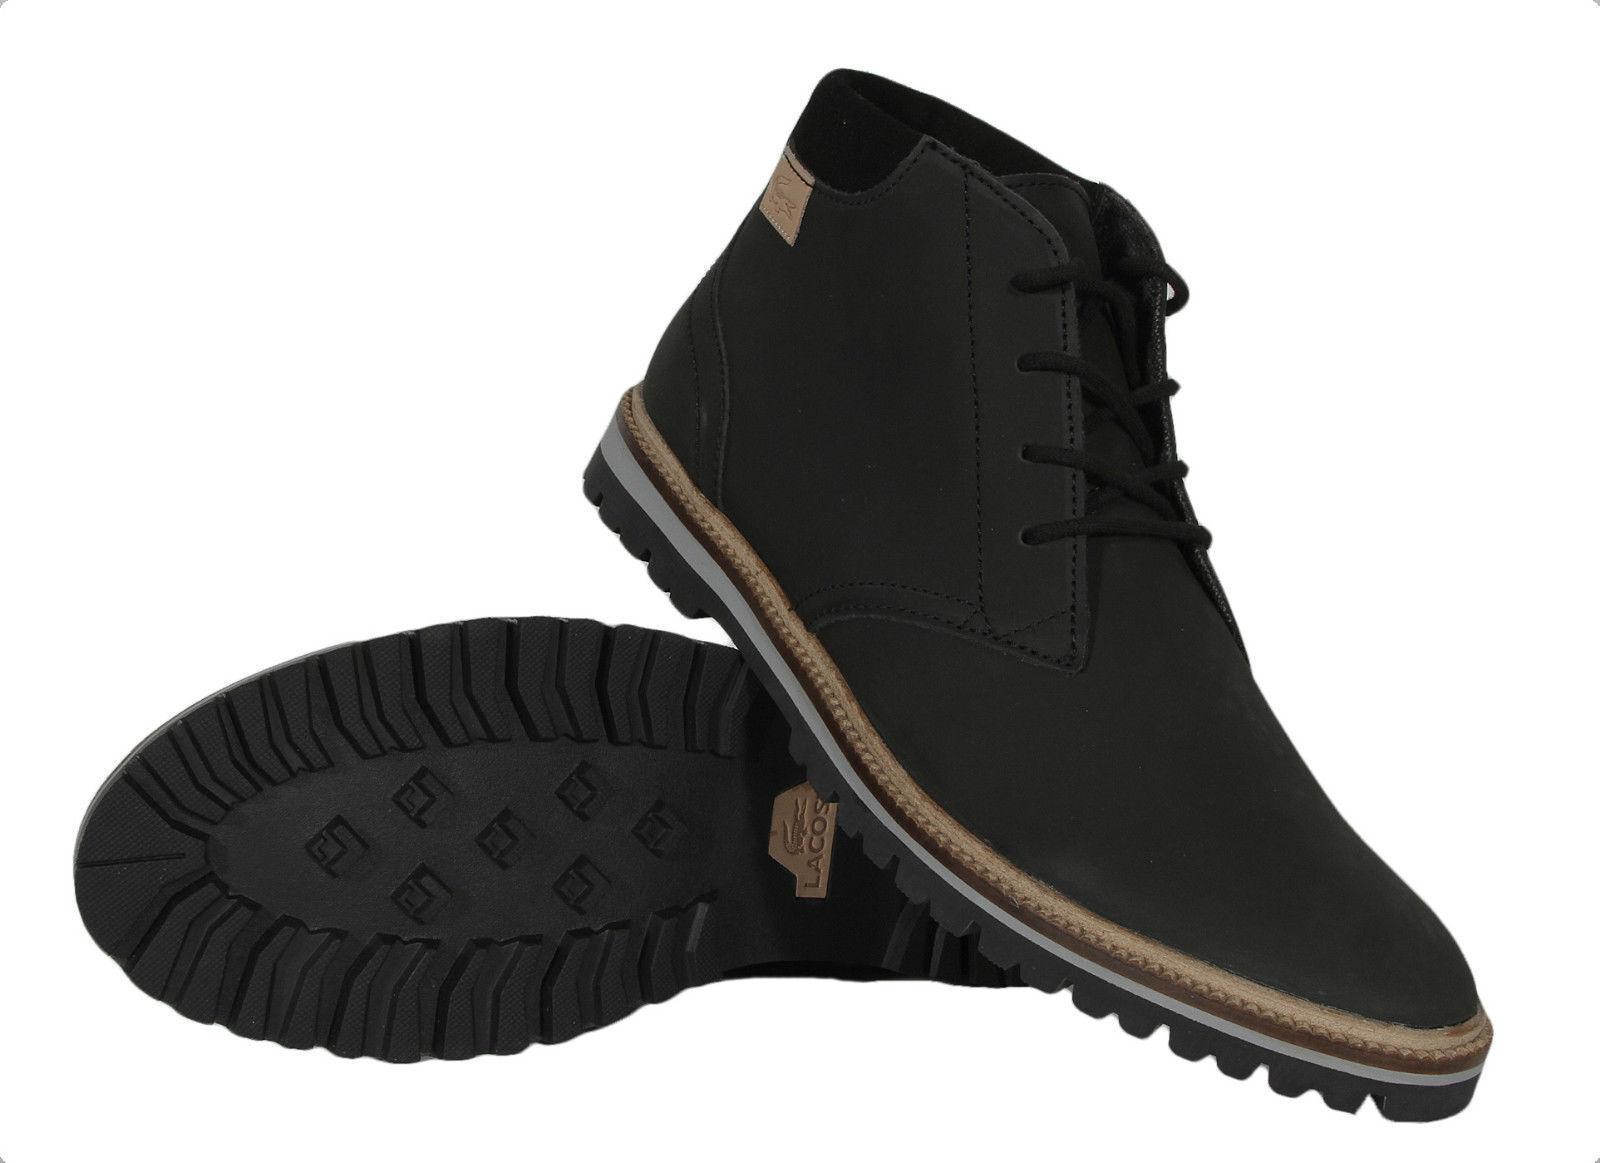 Lacoste Montbard Chukka SRM Leather Sneaker Shoe Black Ankle Boot Men Sz 11-13